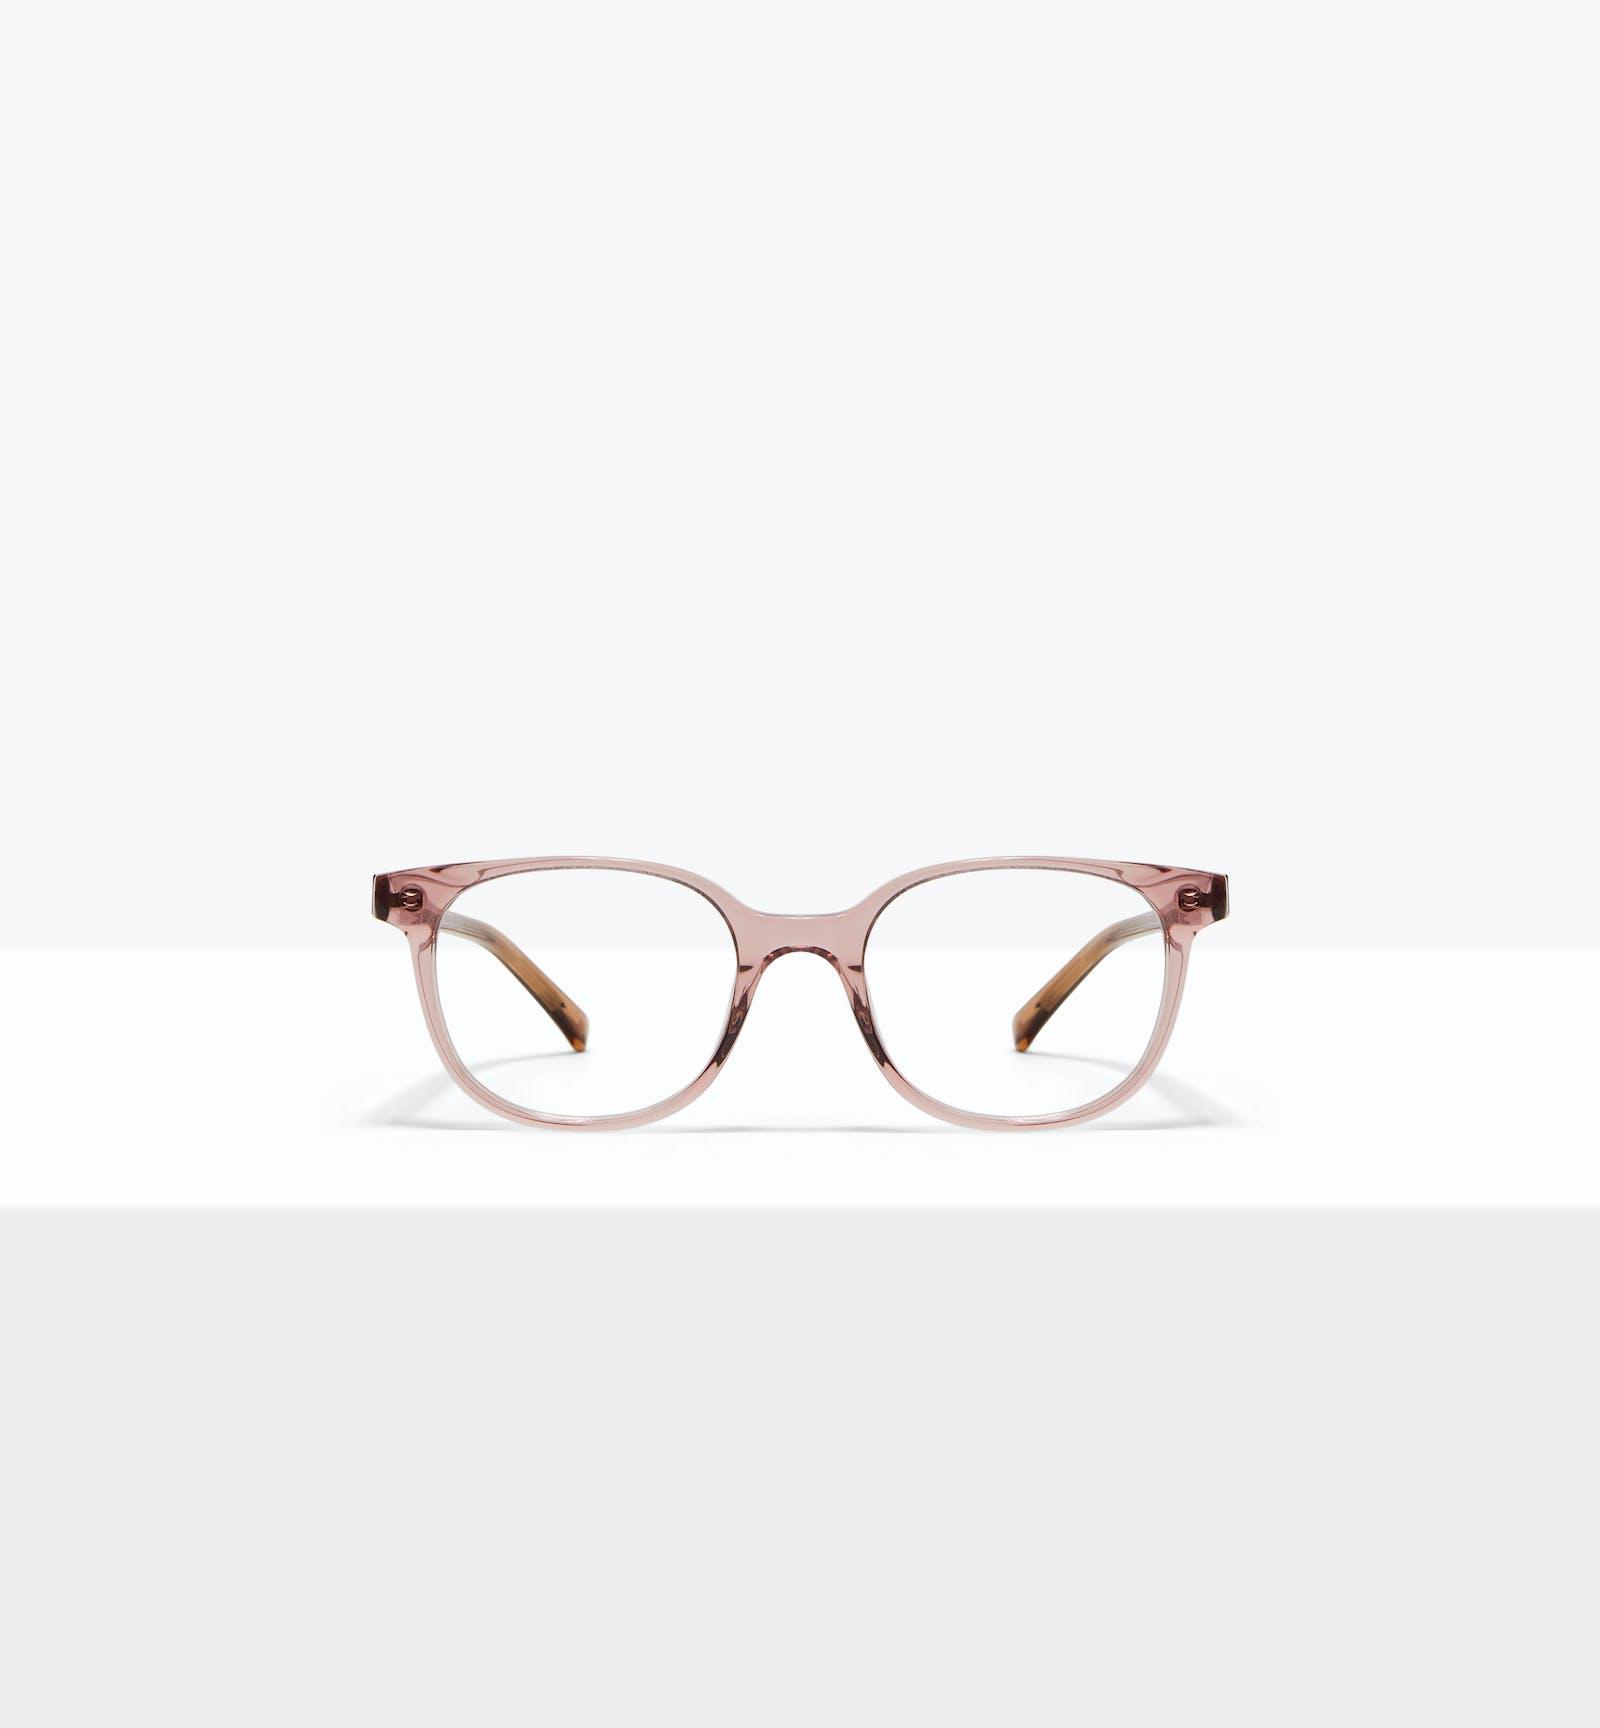 ef4748b98a2 Affordable Fashion Glasses Square Eyeglasses Women Unique Rose